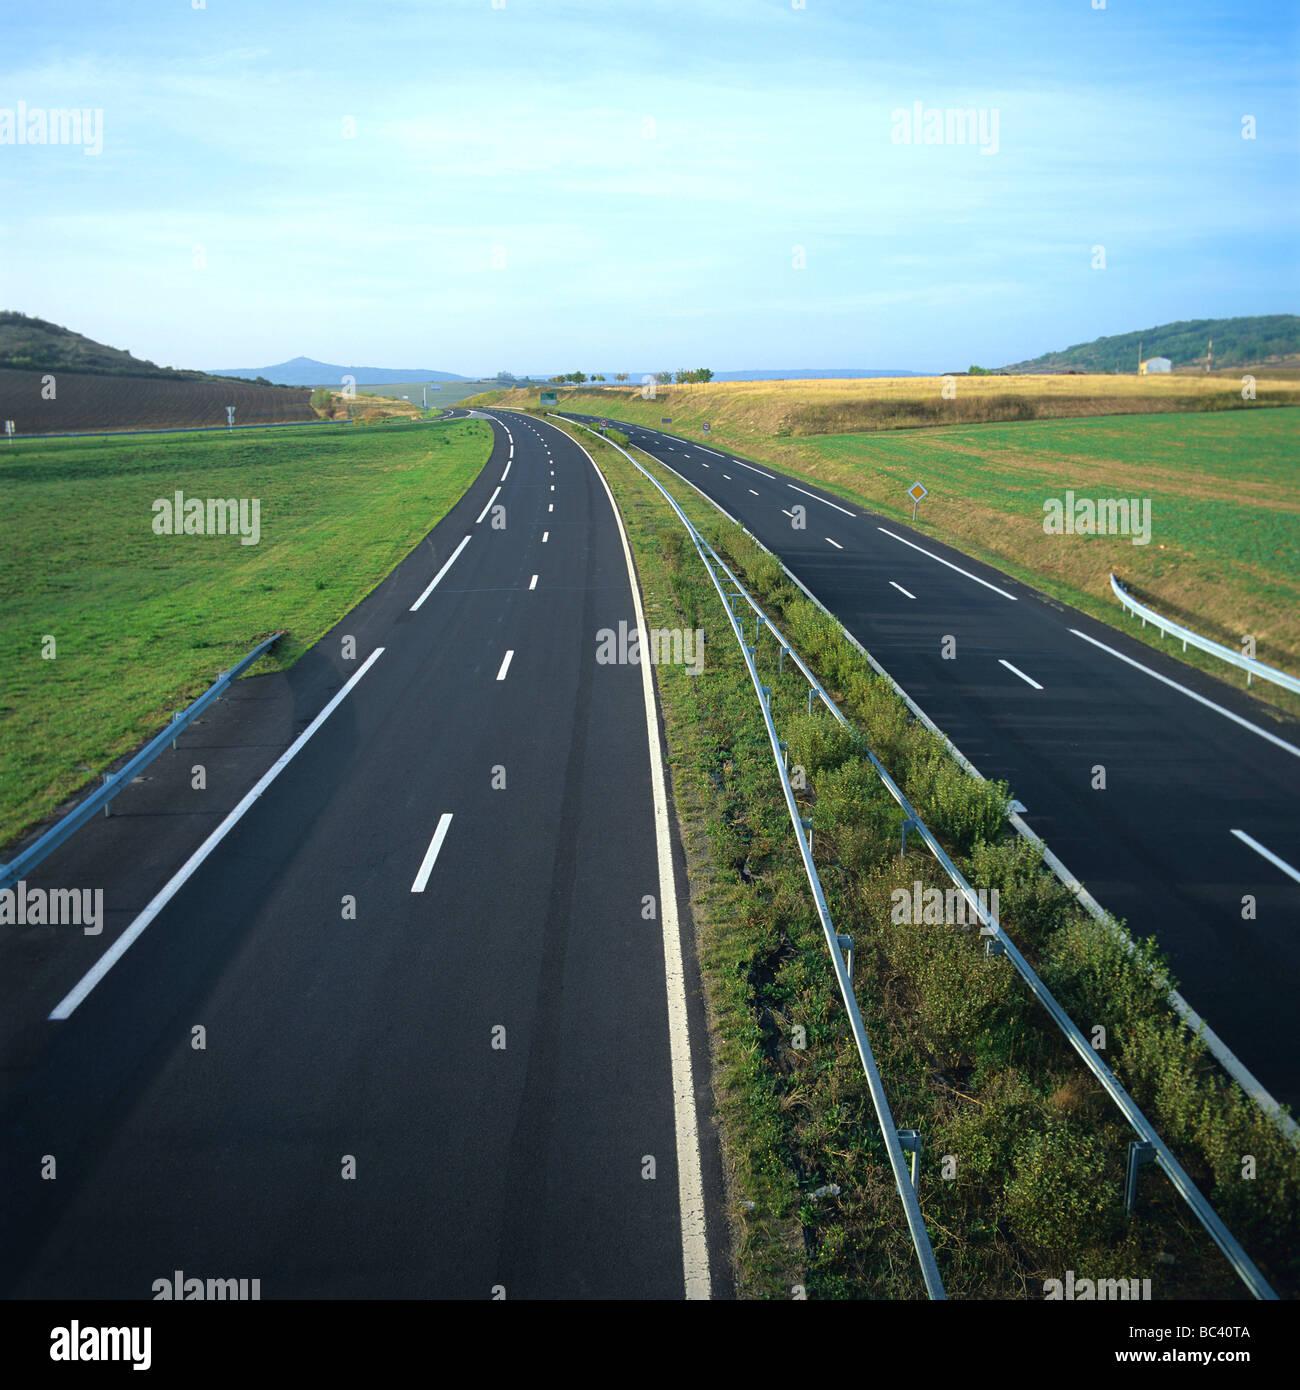 Motorway / dual carriageway - empty - Stock Image